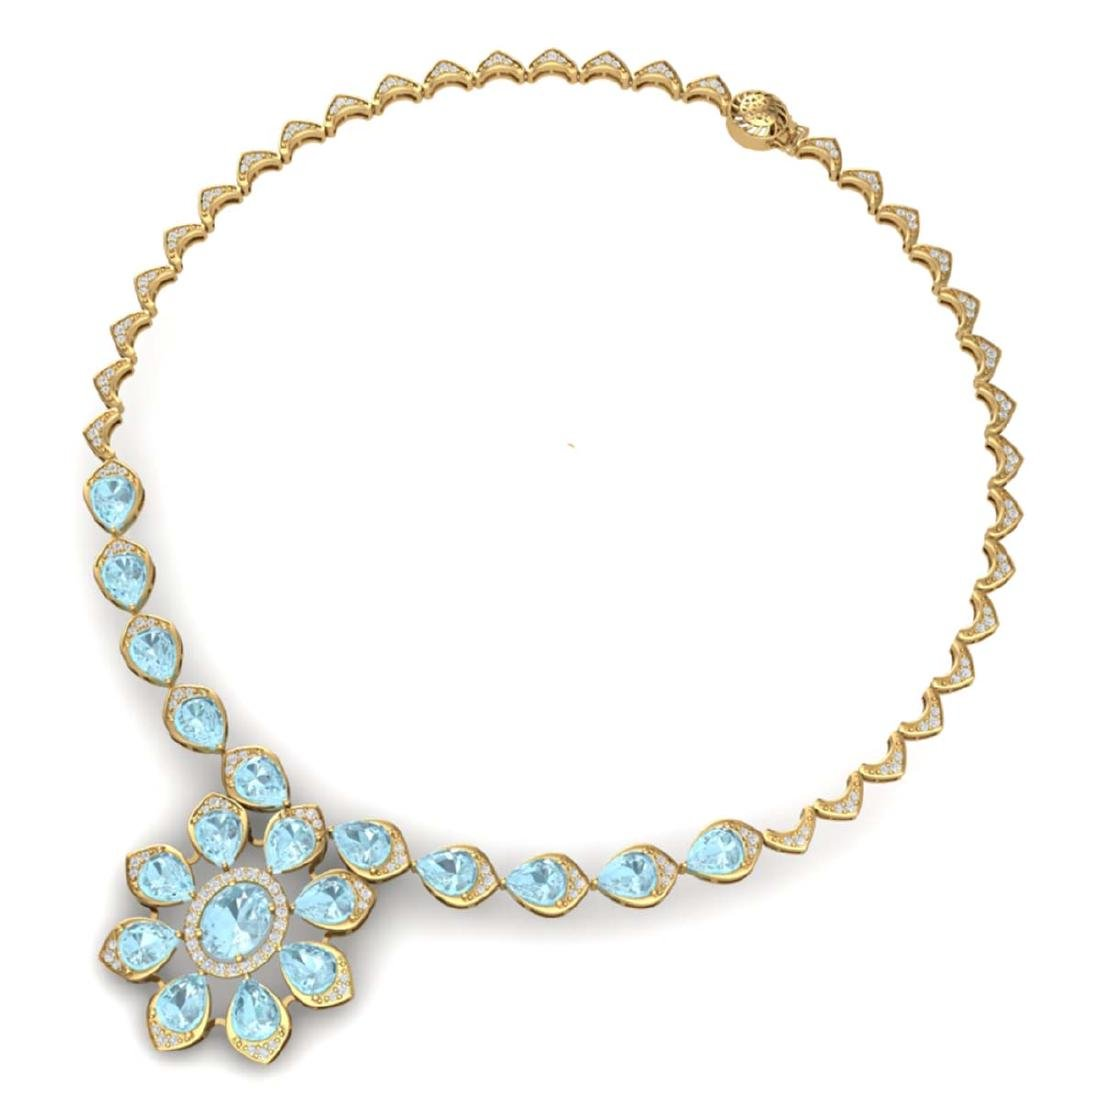 29.34 ctw Sky Topaz & VS Diamond Necklace 18K Yellow - 3